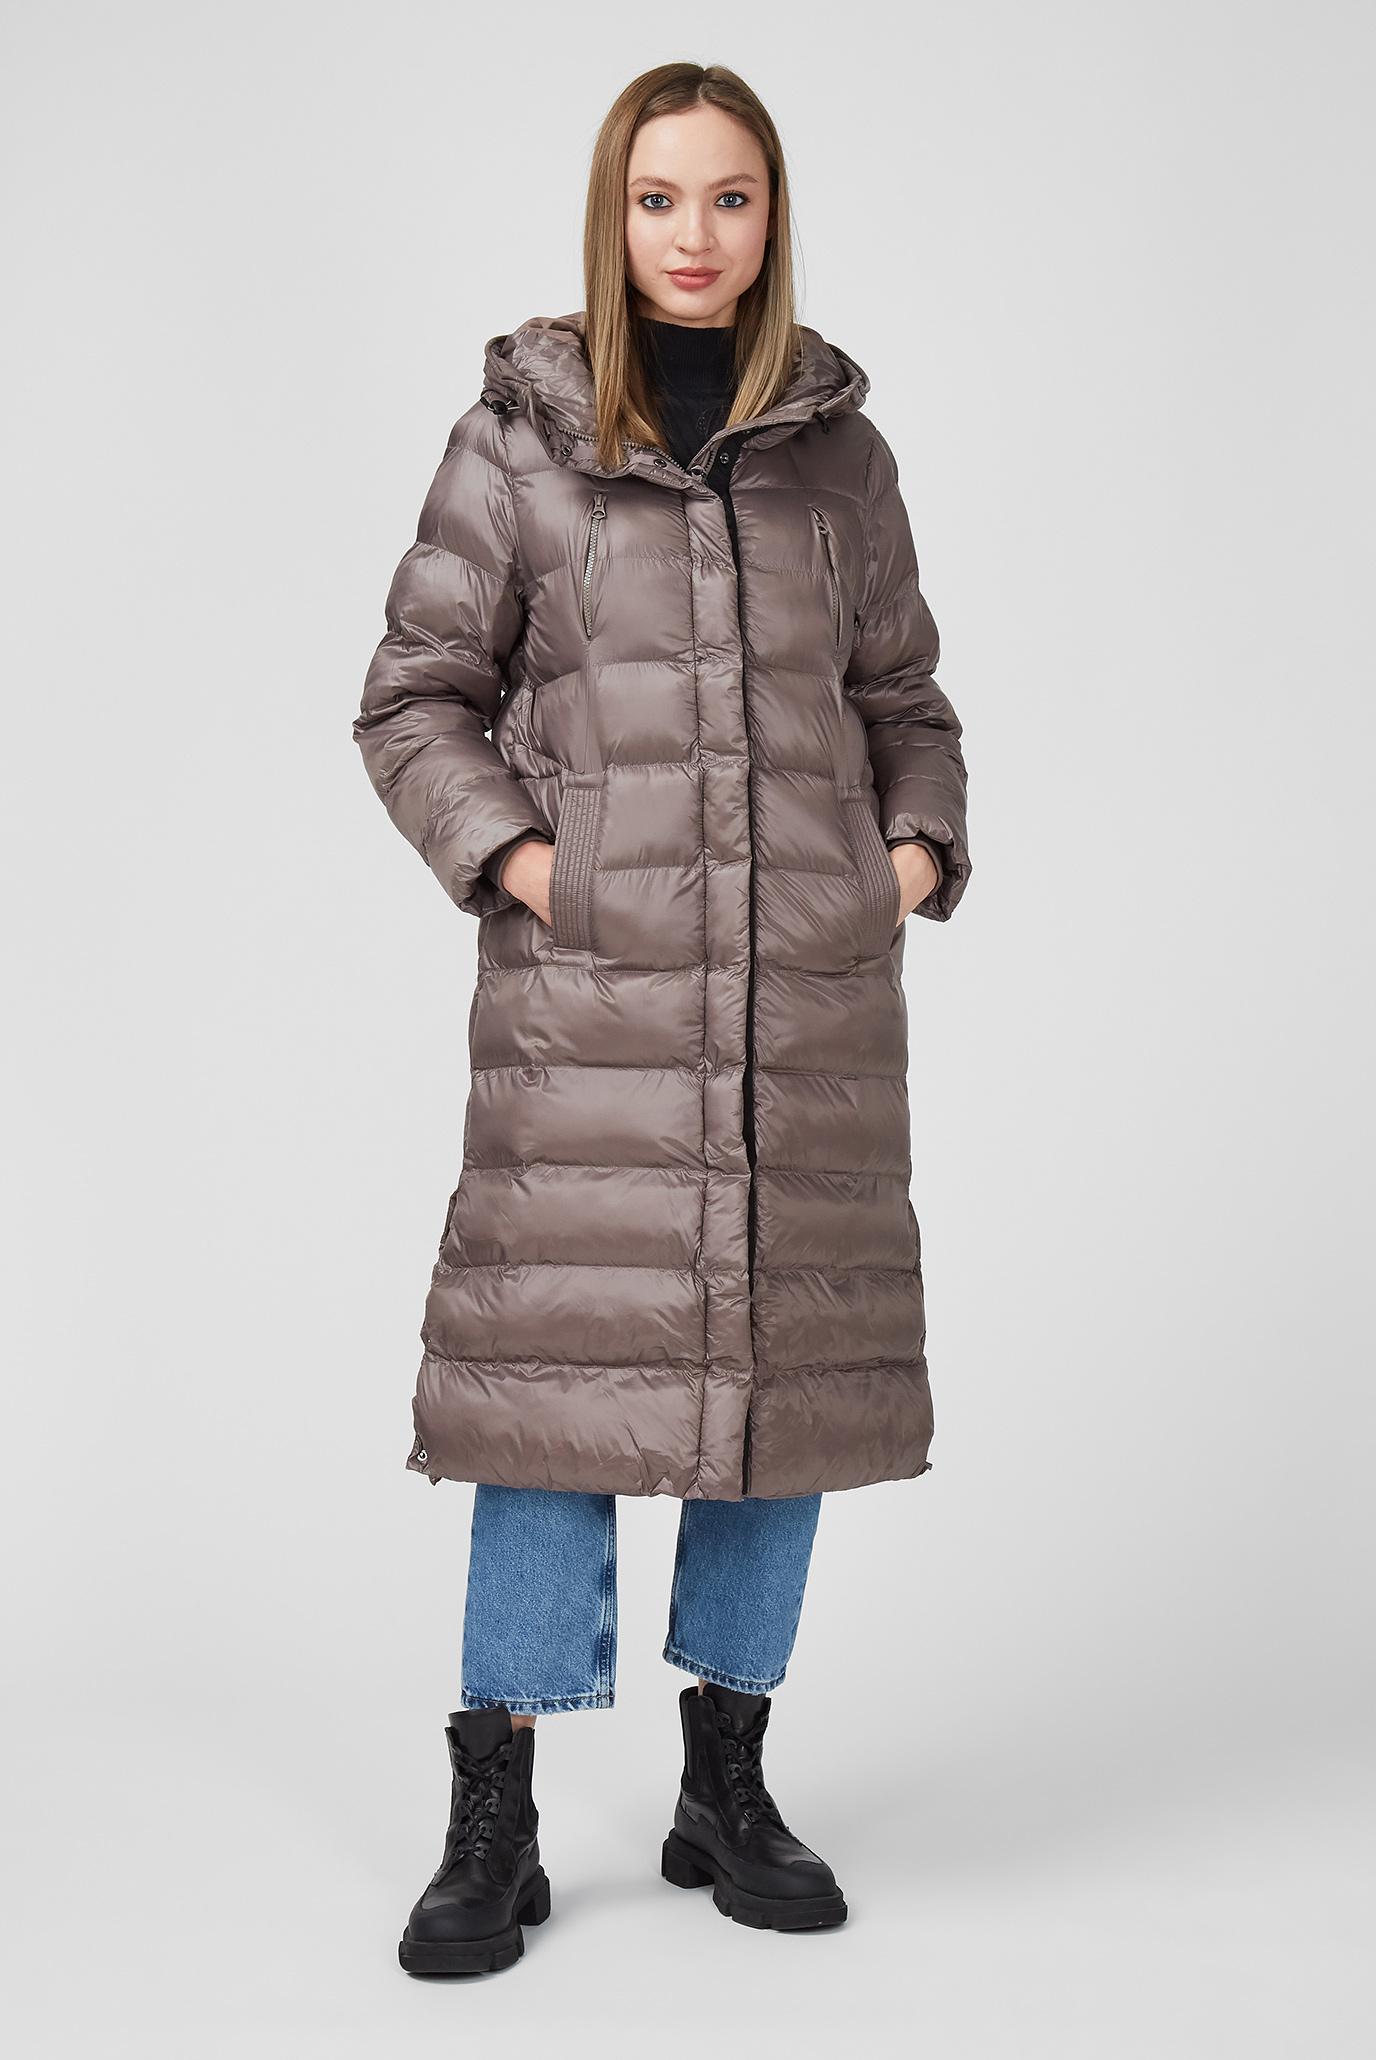 Жіноча коричнева куртка LIZZY 1